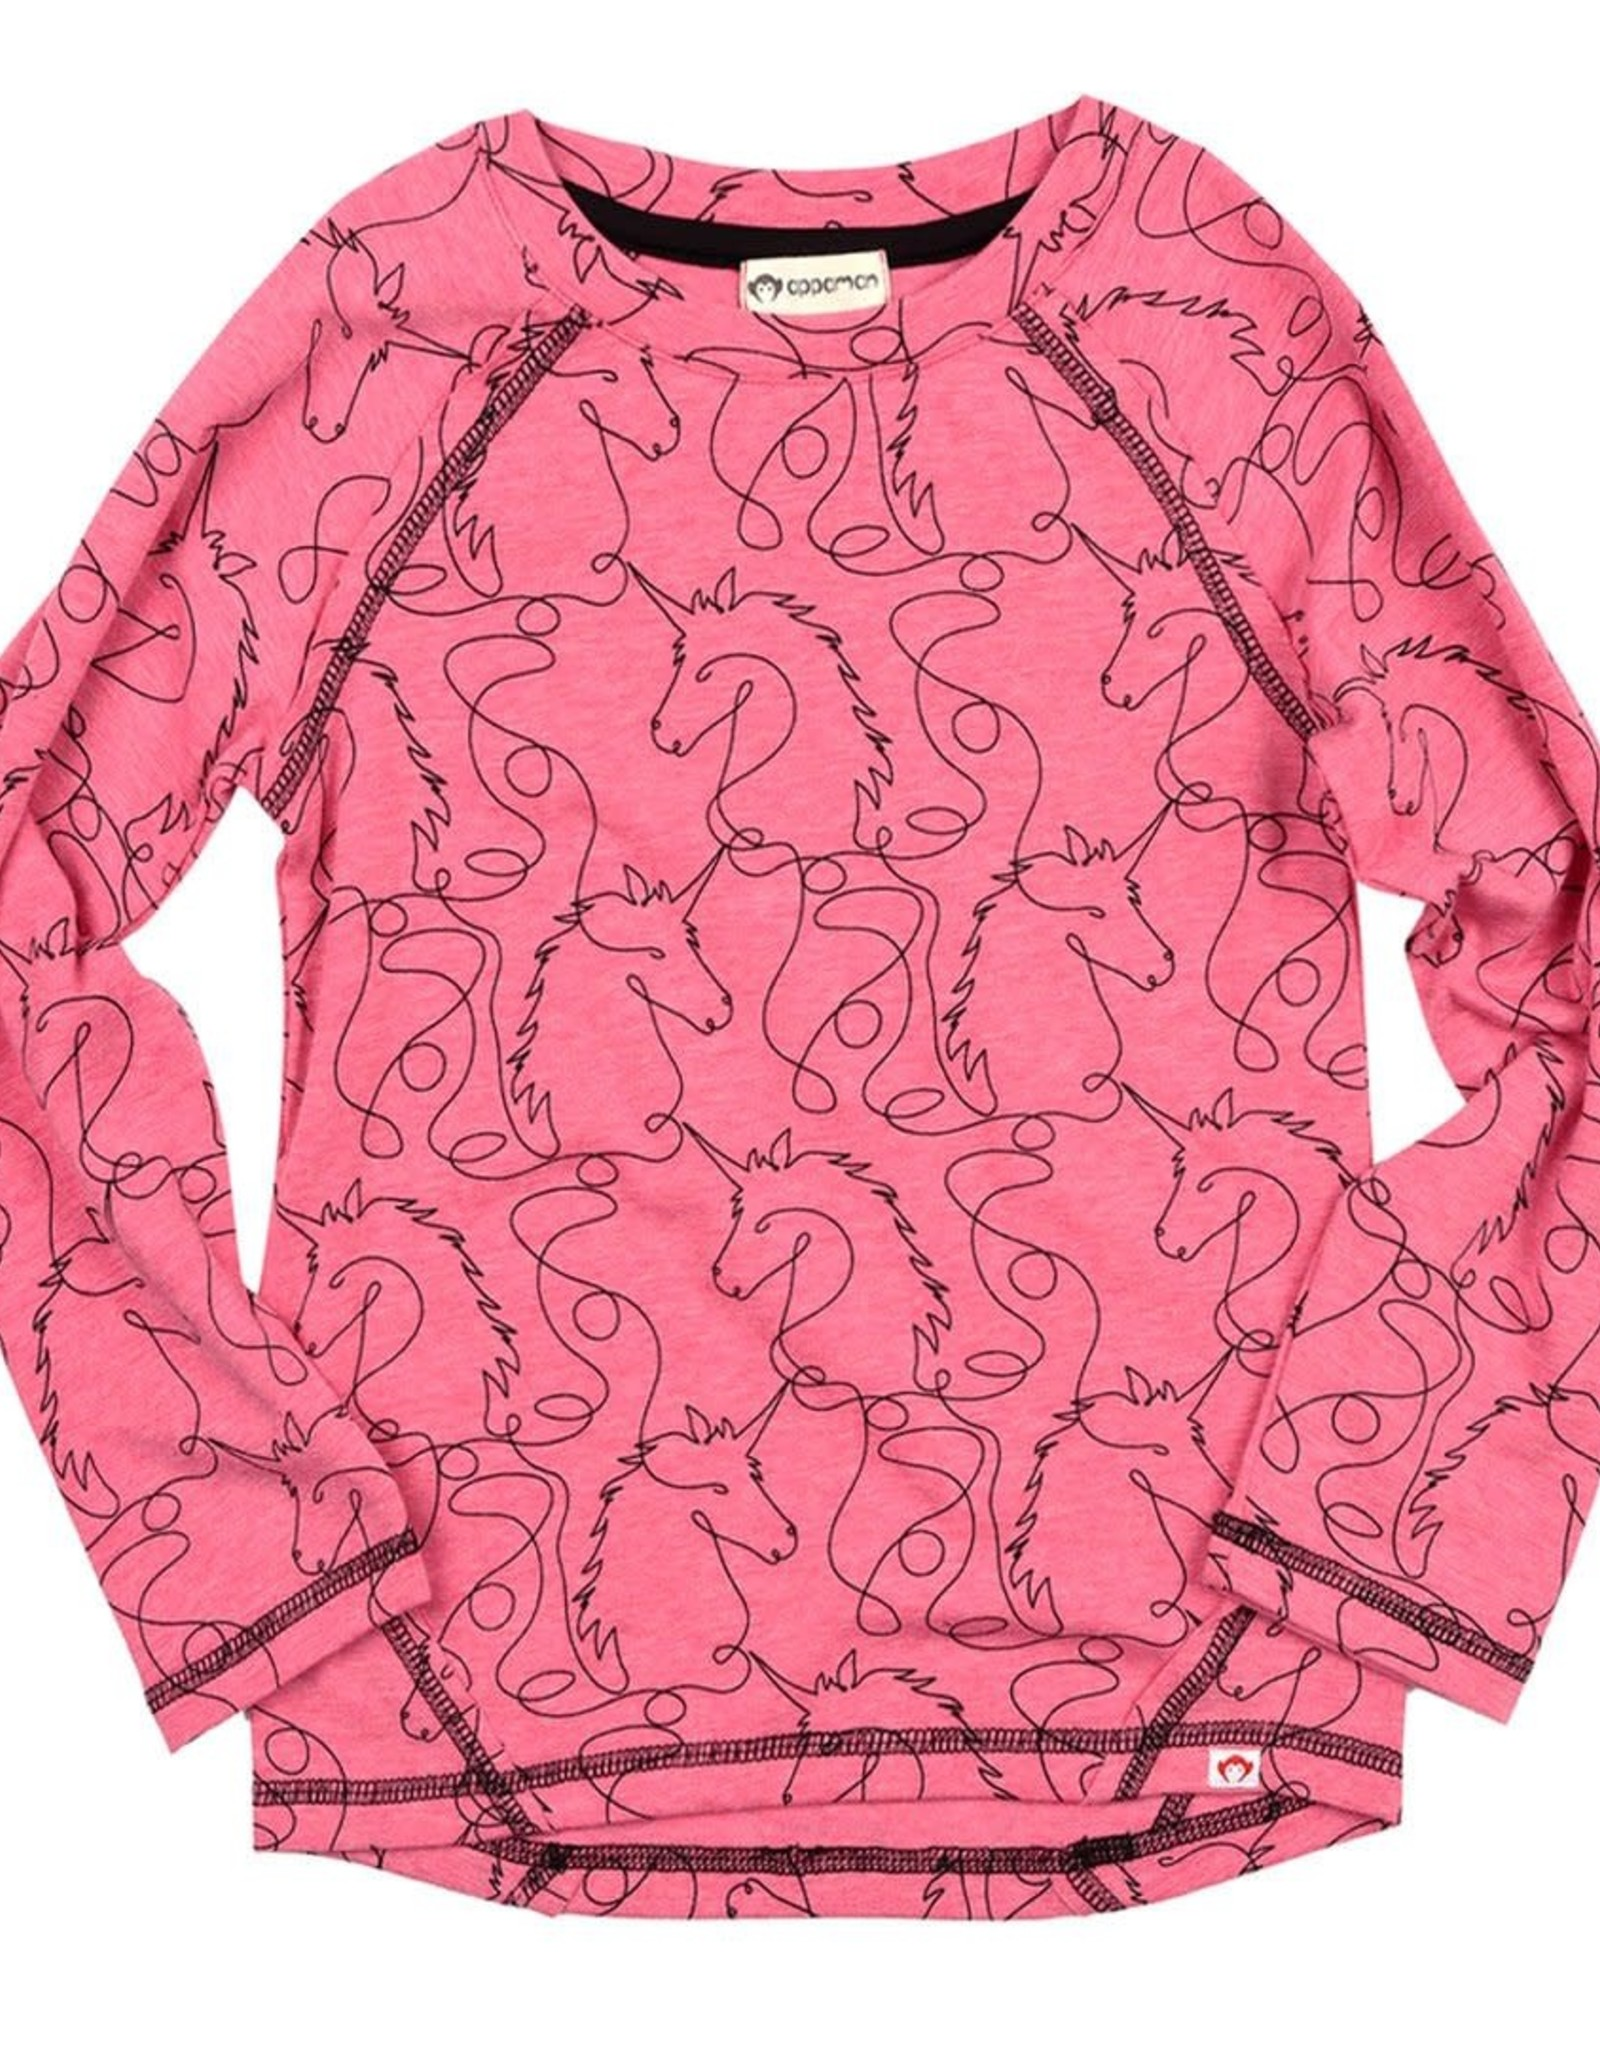 Appaman Adler Tee - Hot Pink Unicorns